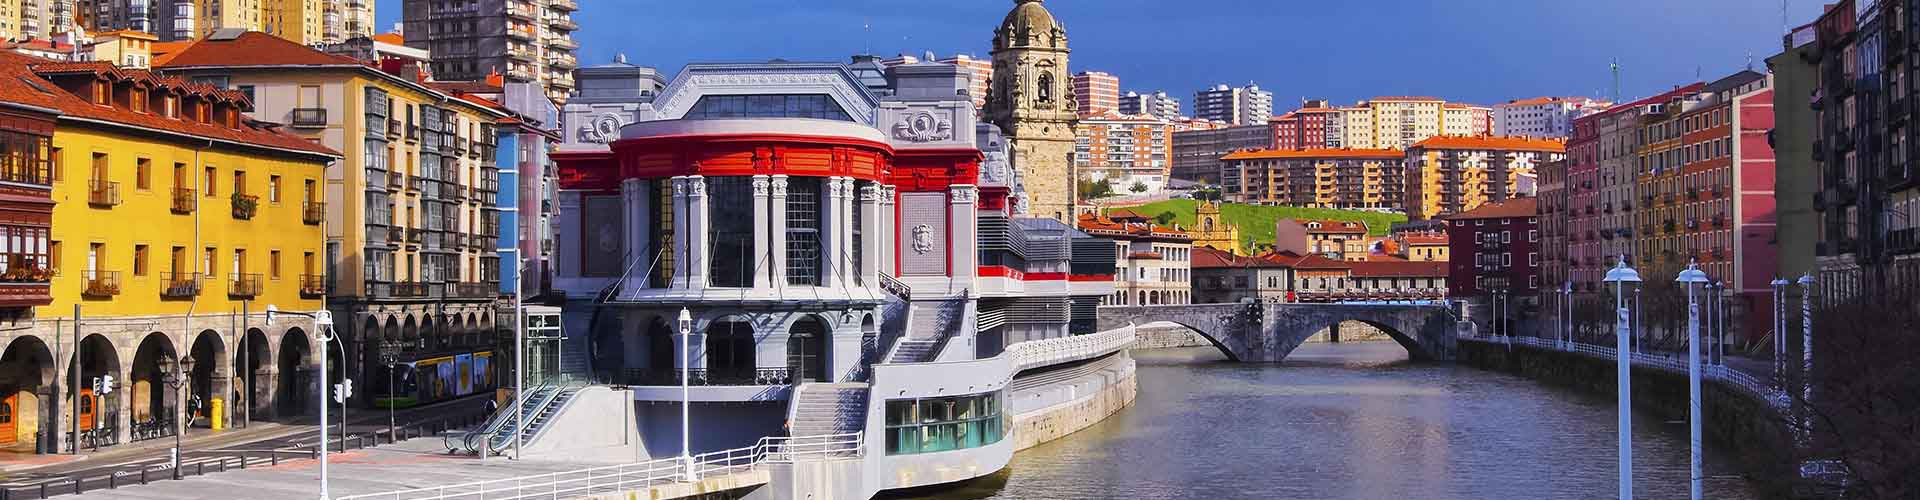 Bilbao - Camping près de City Center. Cartes pour Bilbao, photos et commentaires pour chaque camping à Bilbao.